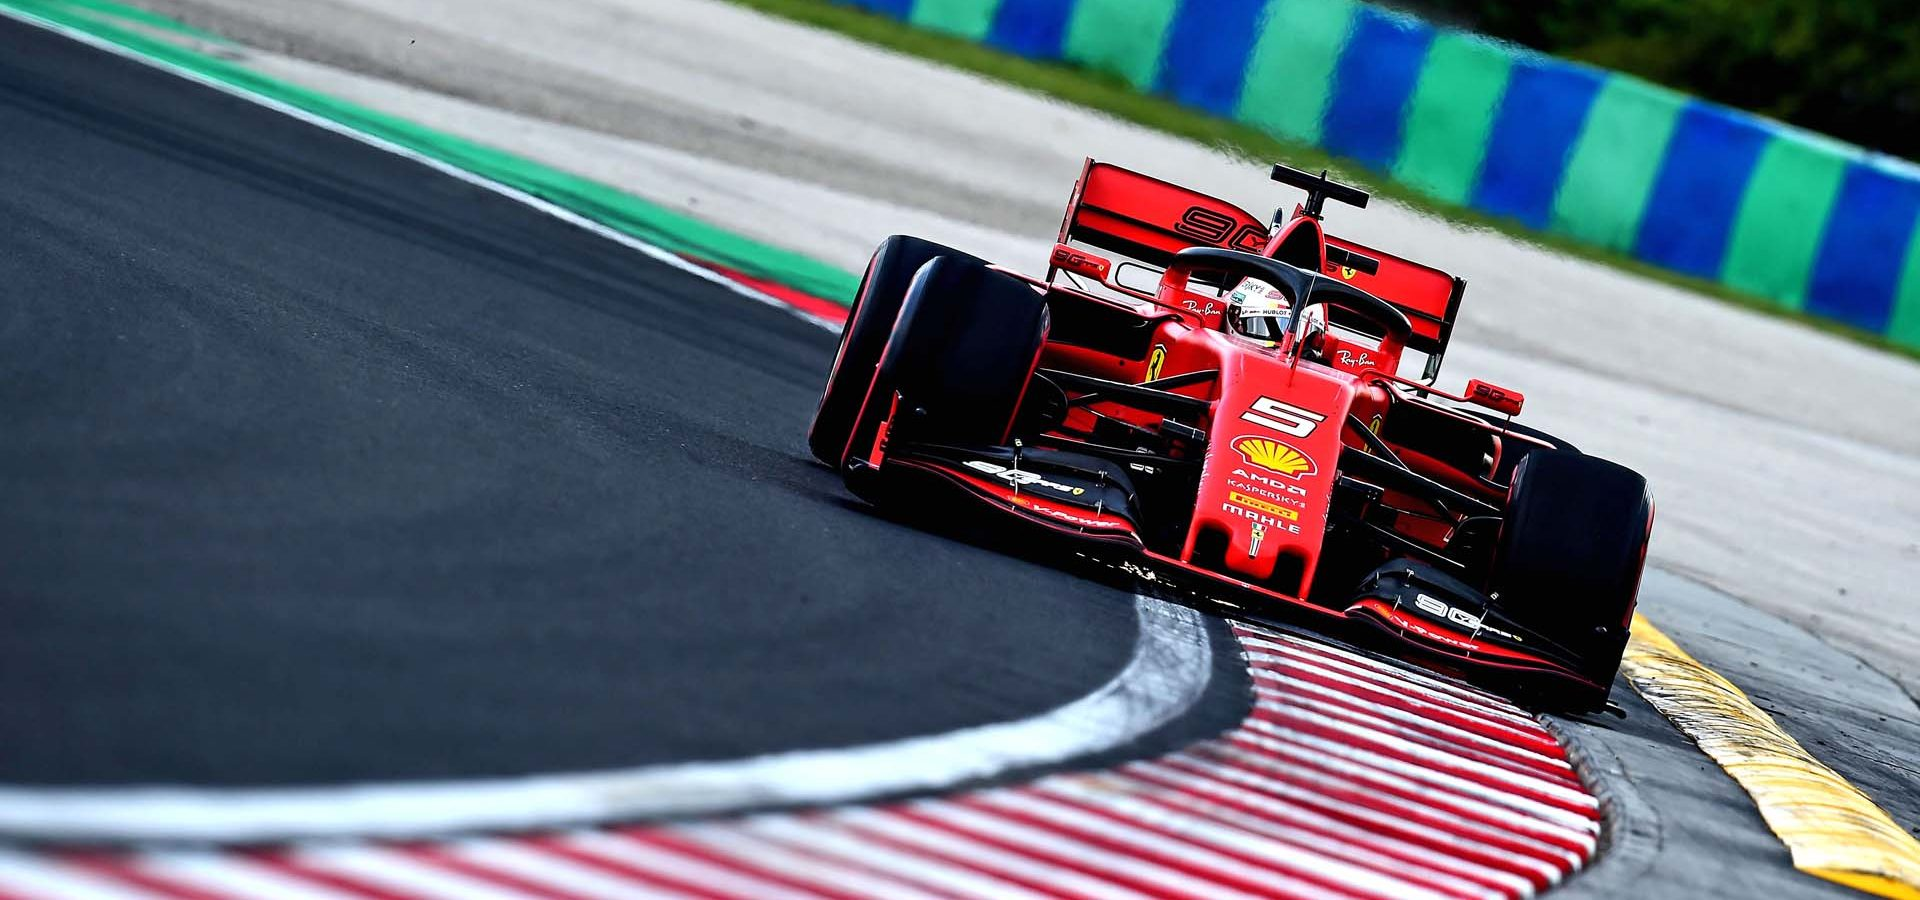 GP UNGHERIA  F1/2019 -  SABATO 03/08/2019 credit: @Scuderia Ferrari Press Office Sebastian Vettel Ferrari